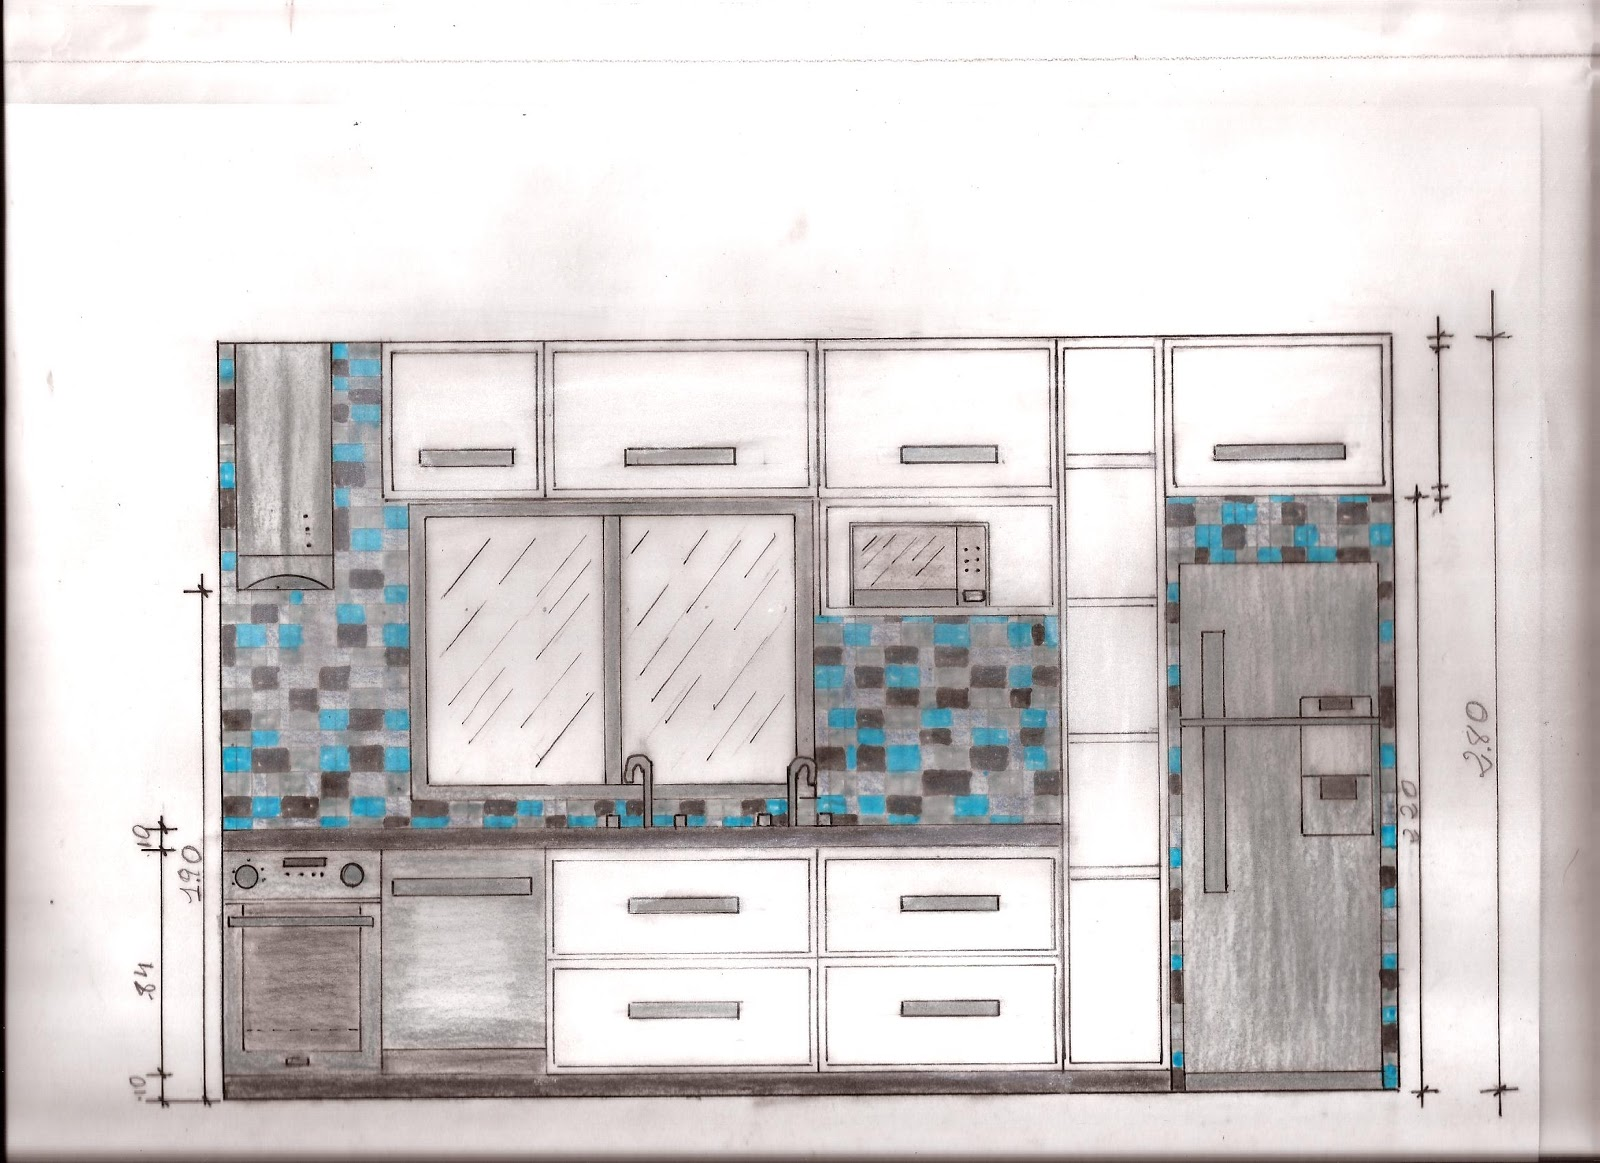 #348197 Related Pictures Projetos Casas Duplex Tis Ptax Dyndns Jongose Ninja 1600x1163 px Bancada Cozinha Americana Inox #1275 imagens